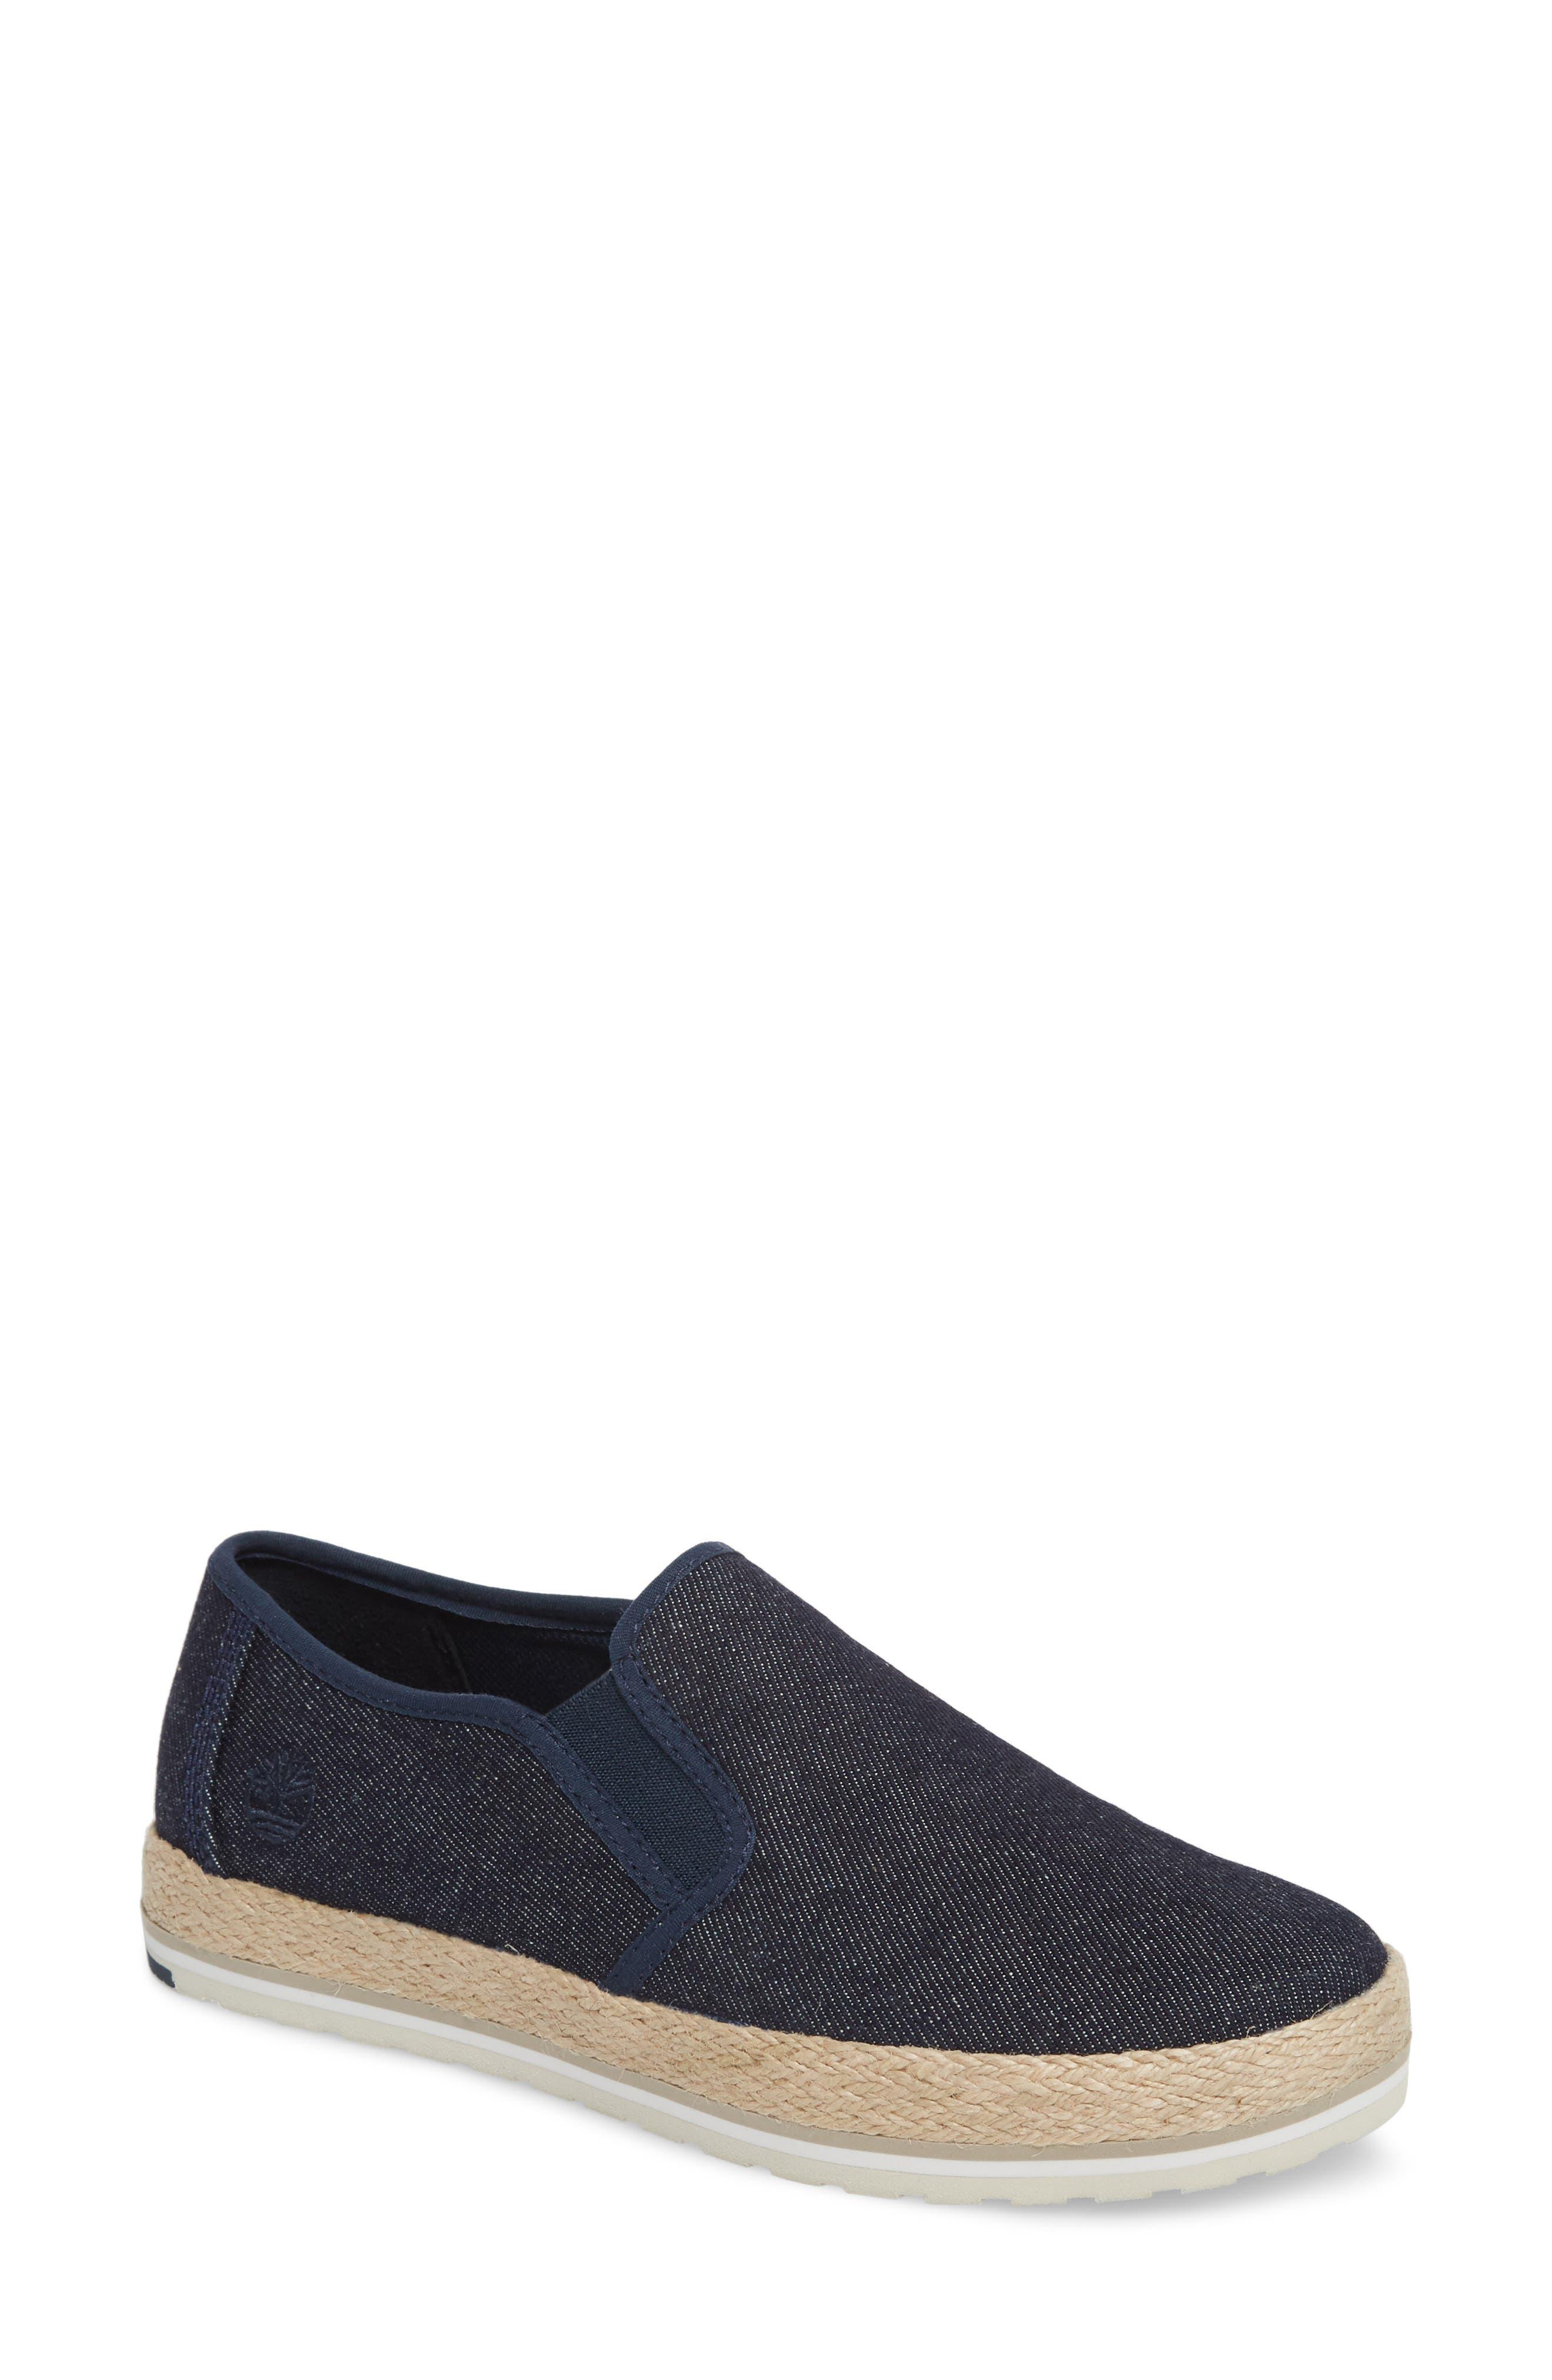 Eivissa Sea Slip-On Sneaker,                             Main thumbnail 1, color,                             Navy Canvas